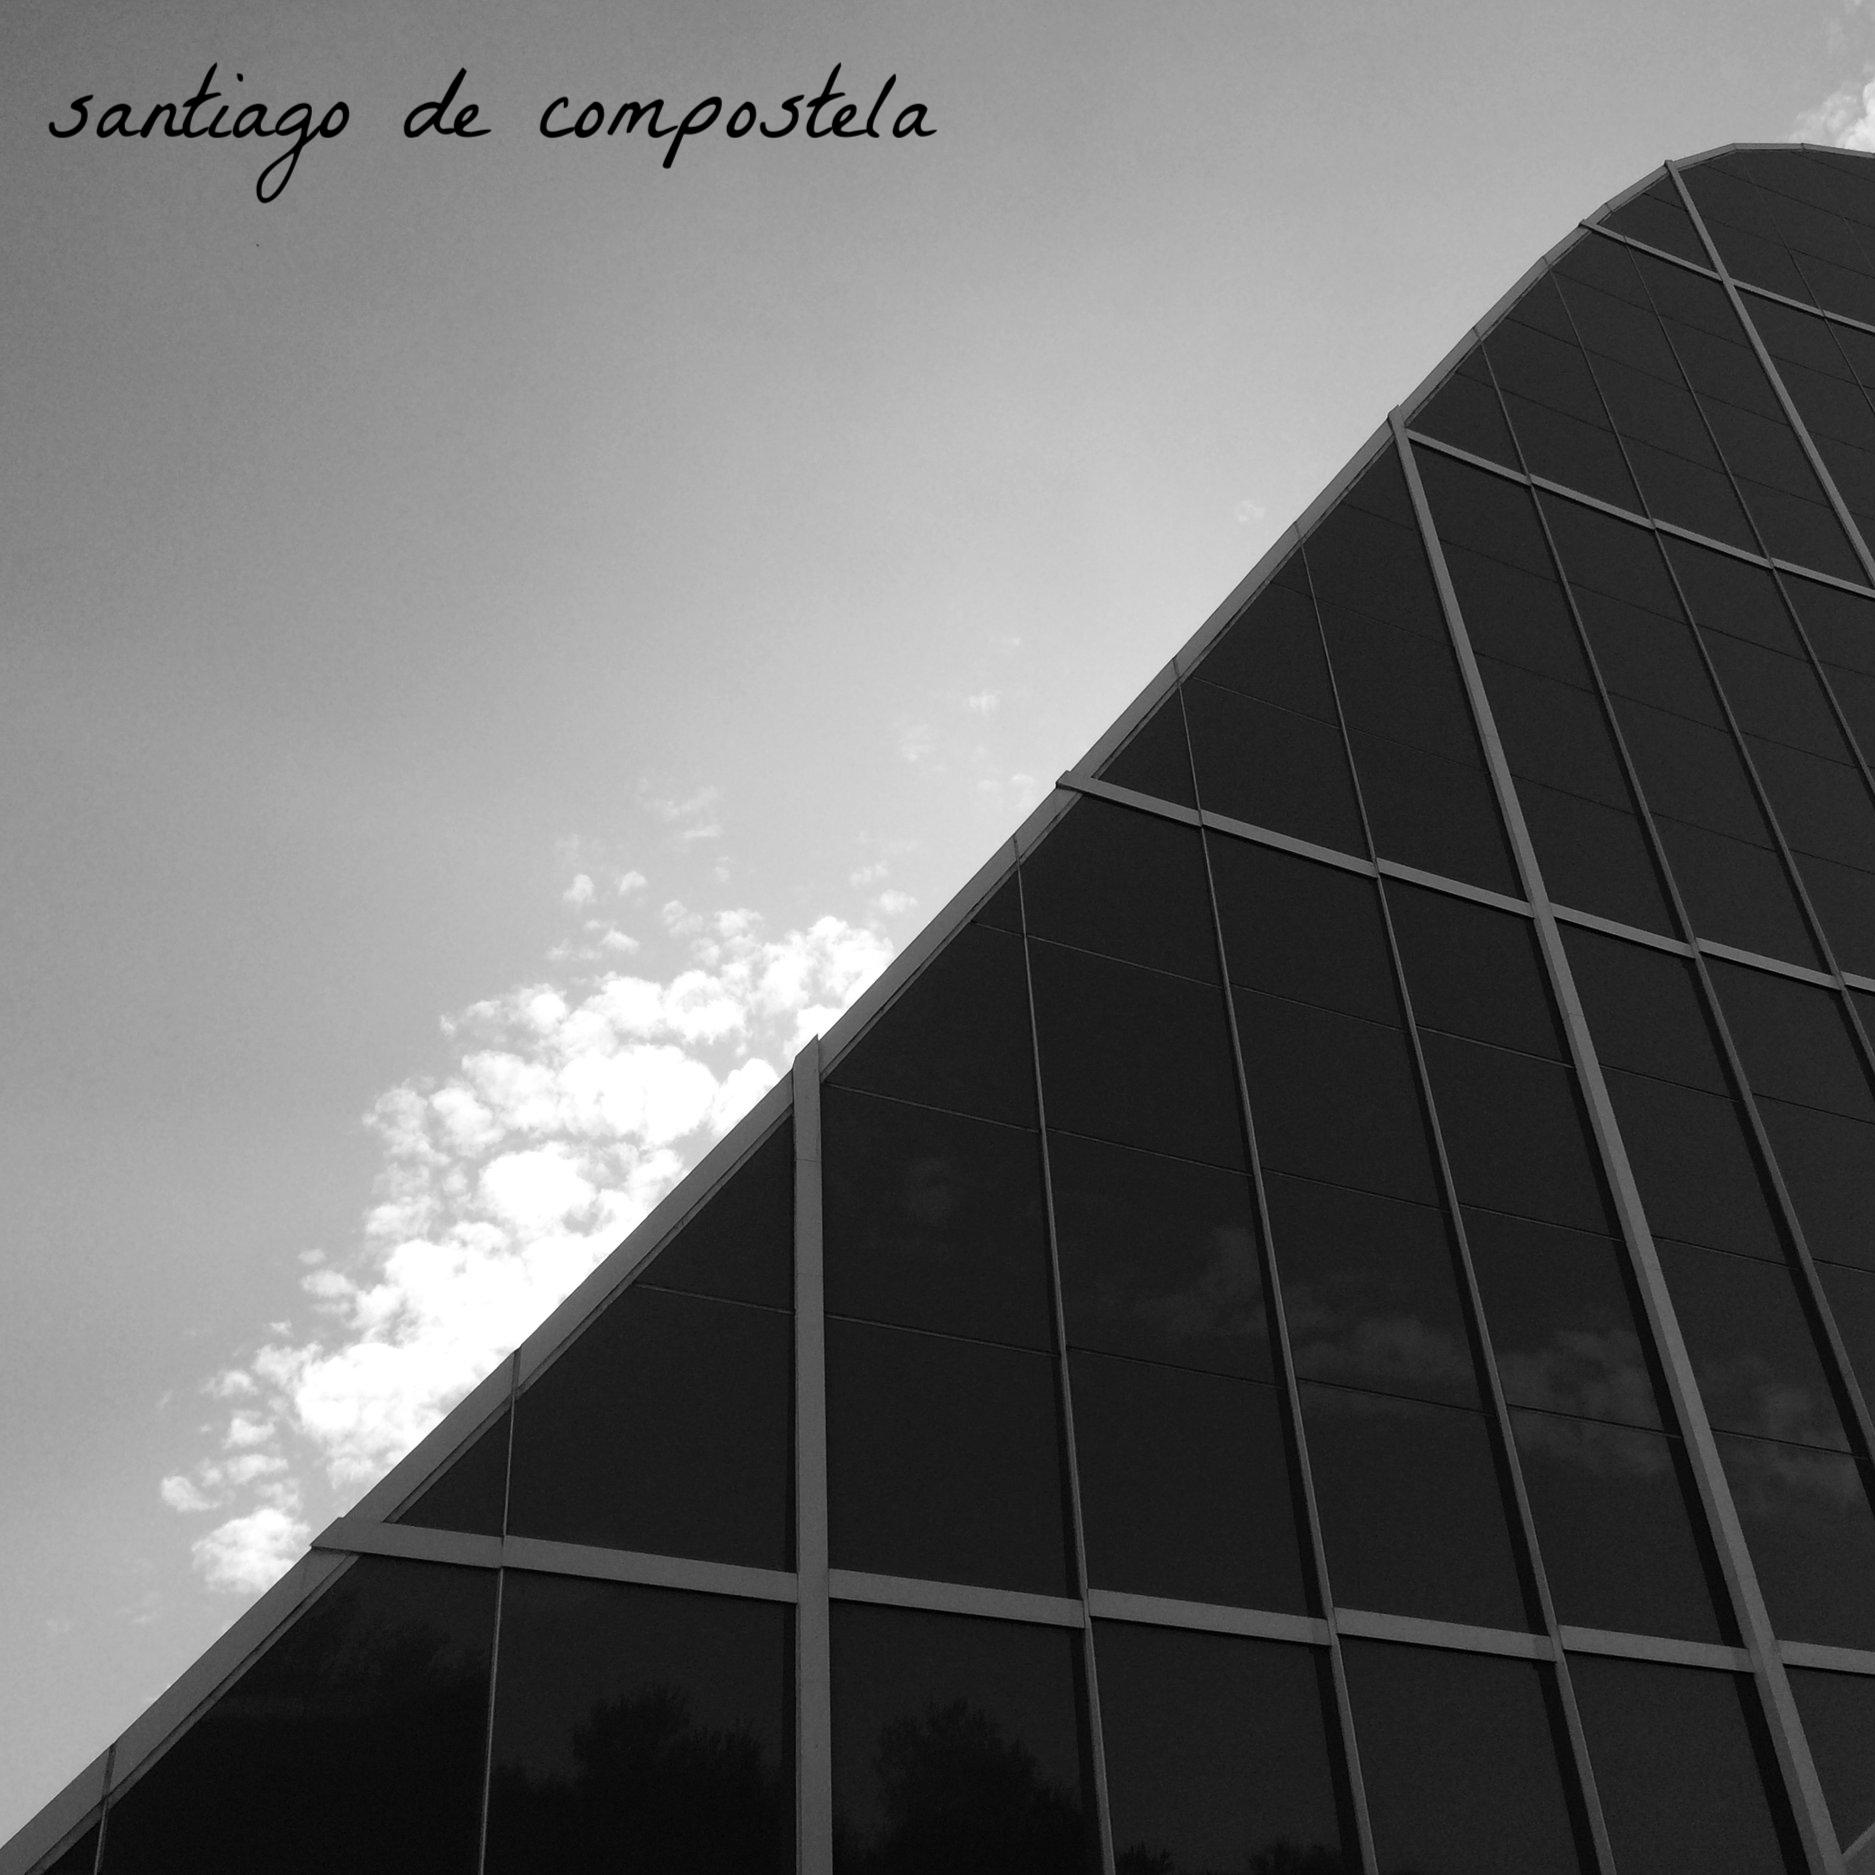 santiago_de_compostela_home